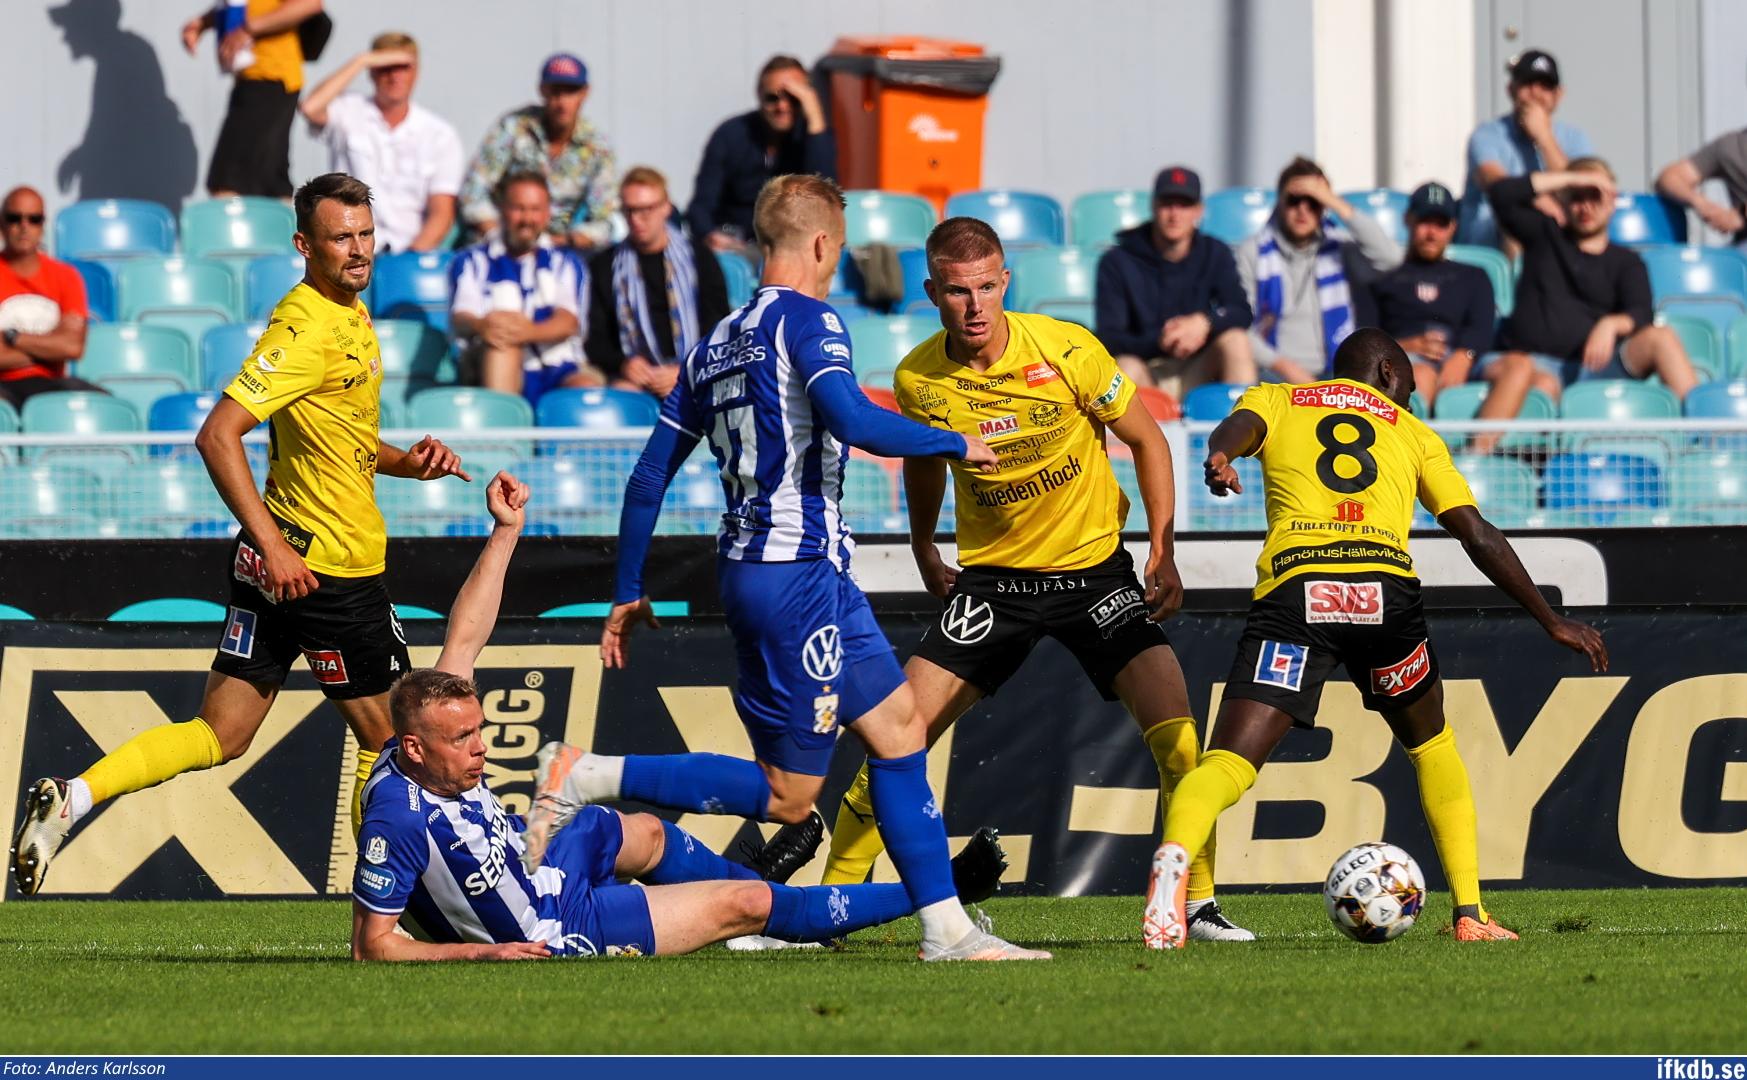 Sunday 18th of July 2021: IFK Göteborg – Mjällby AIF 3–2